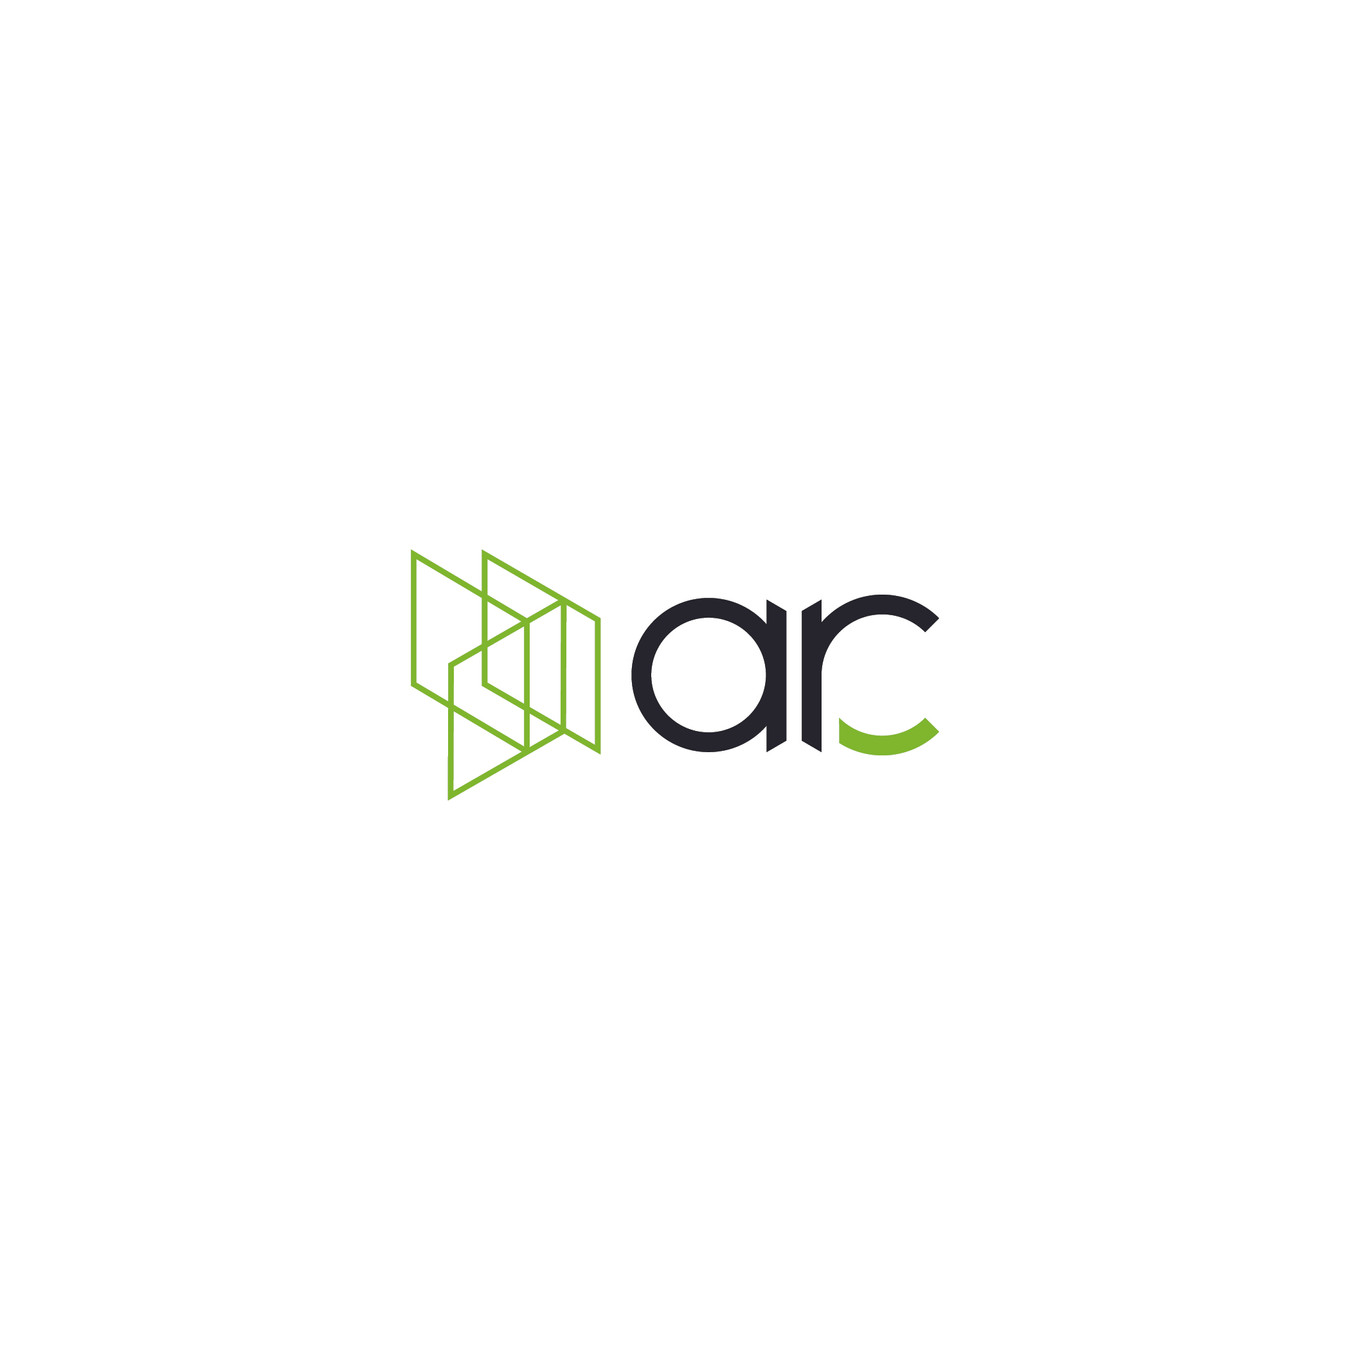 arc_logo_greenonwhite.jpg